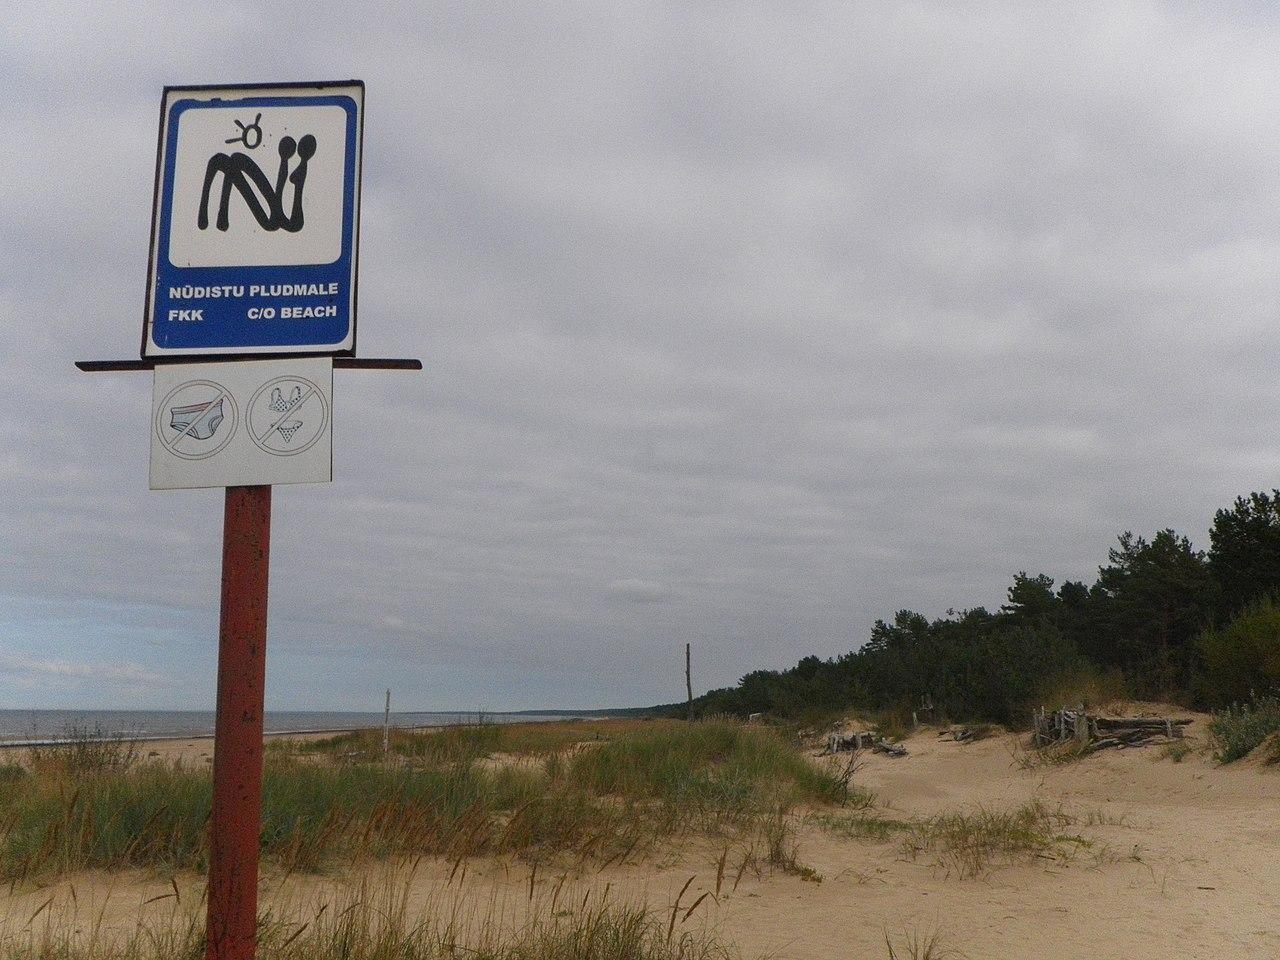 Vecāķi nude beach.jpg